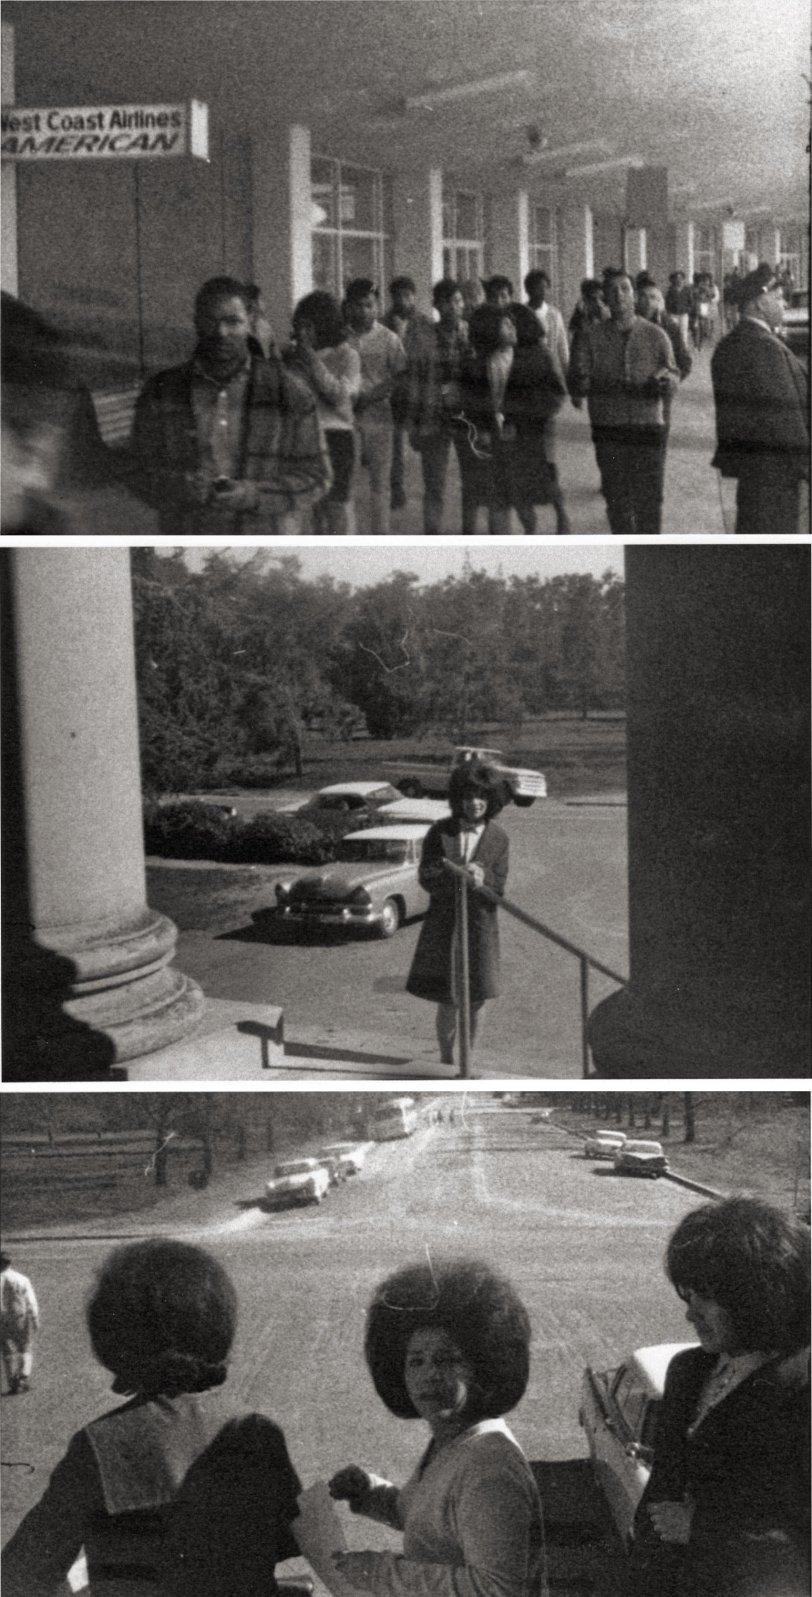 Oakland: 1960s